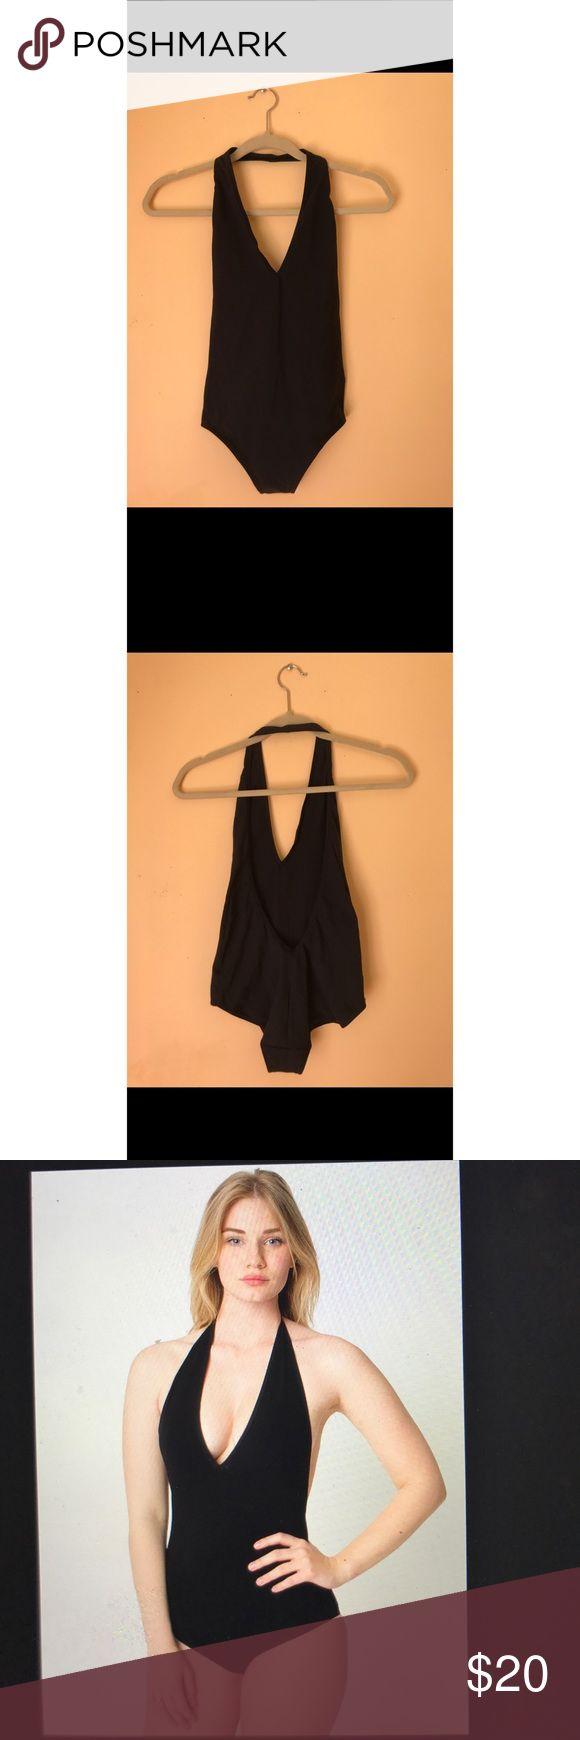 American apparel cotton spandex halter leotard Black thong halter leotard from American apparel. Worn once. Size medium. American Apparel Other